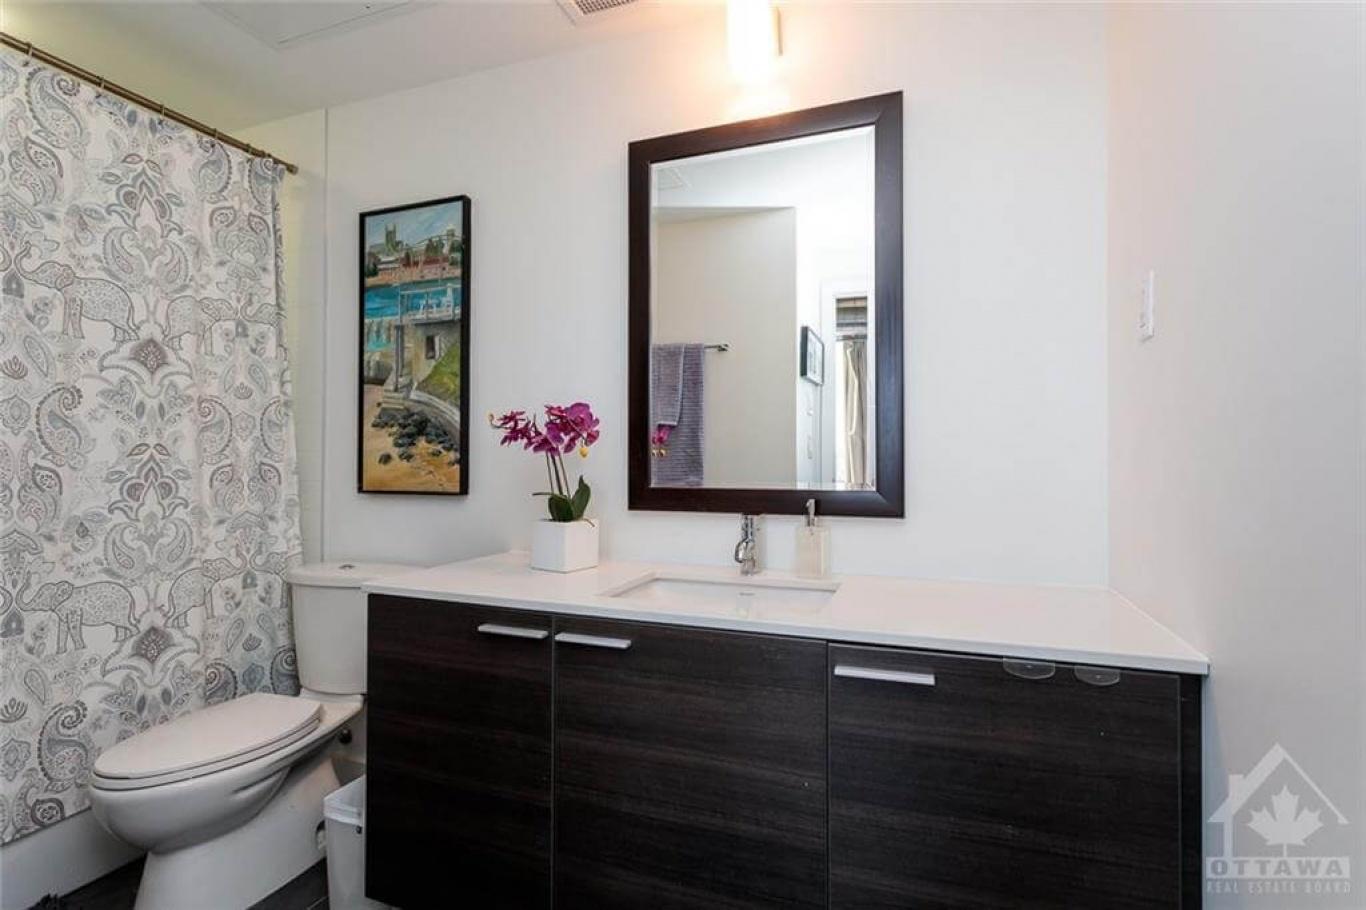 349 McLeod St, Ottawa, Ontario K2P 0S1, 2 Bedrooms Bedrooms, ,2 BathroomsBathrooms,Apartment,For Sale,McLeod St,527,1020